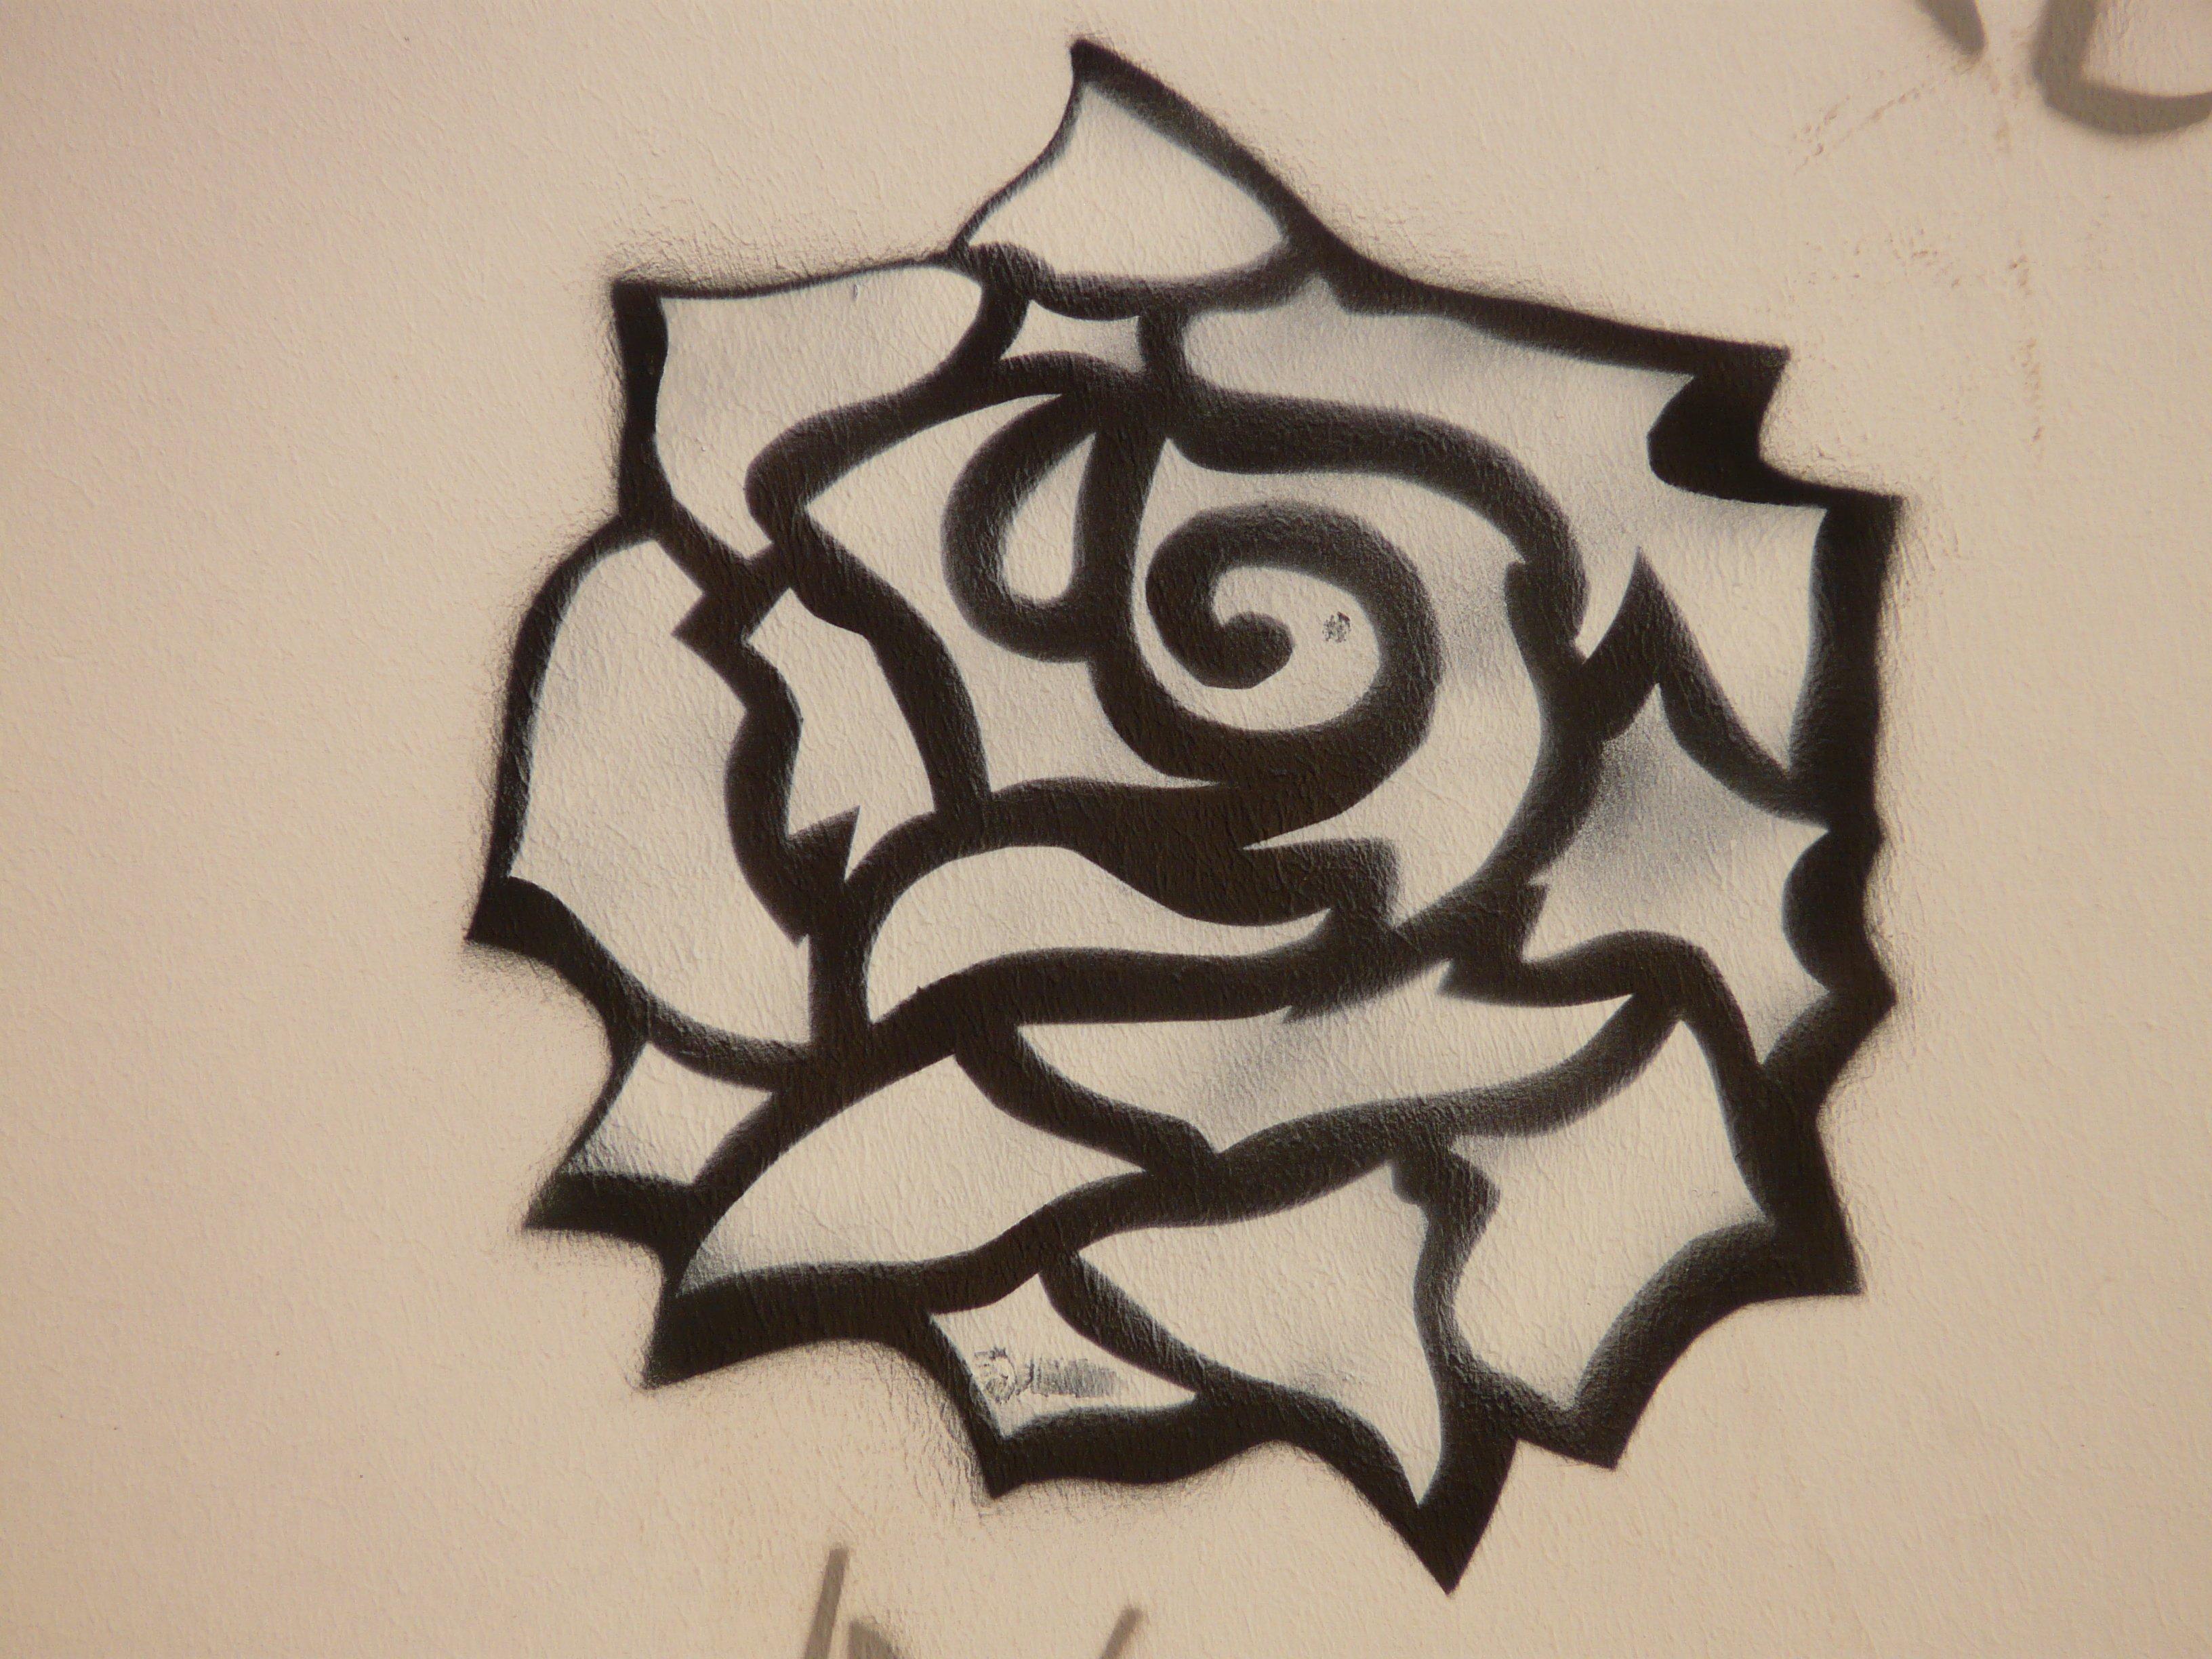 Gambar Hewan Mawar Pola Cat Coretan Karya Seni Lukisan Fon